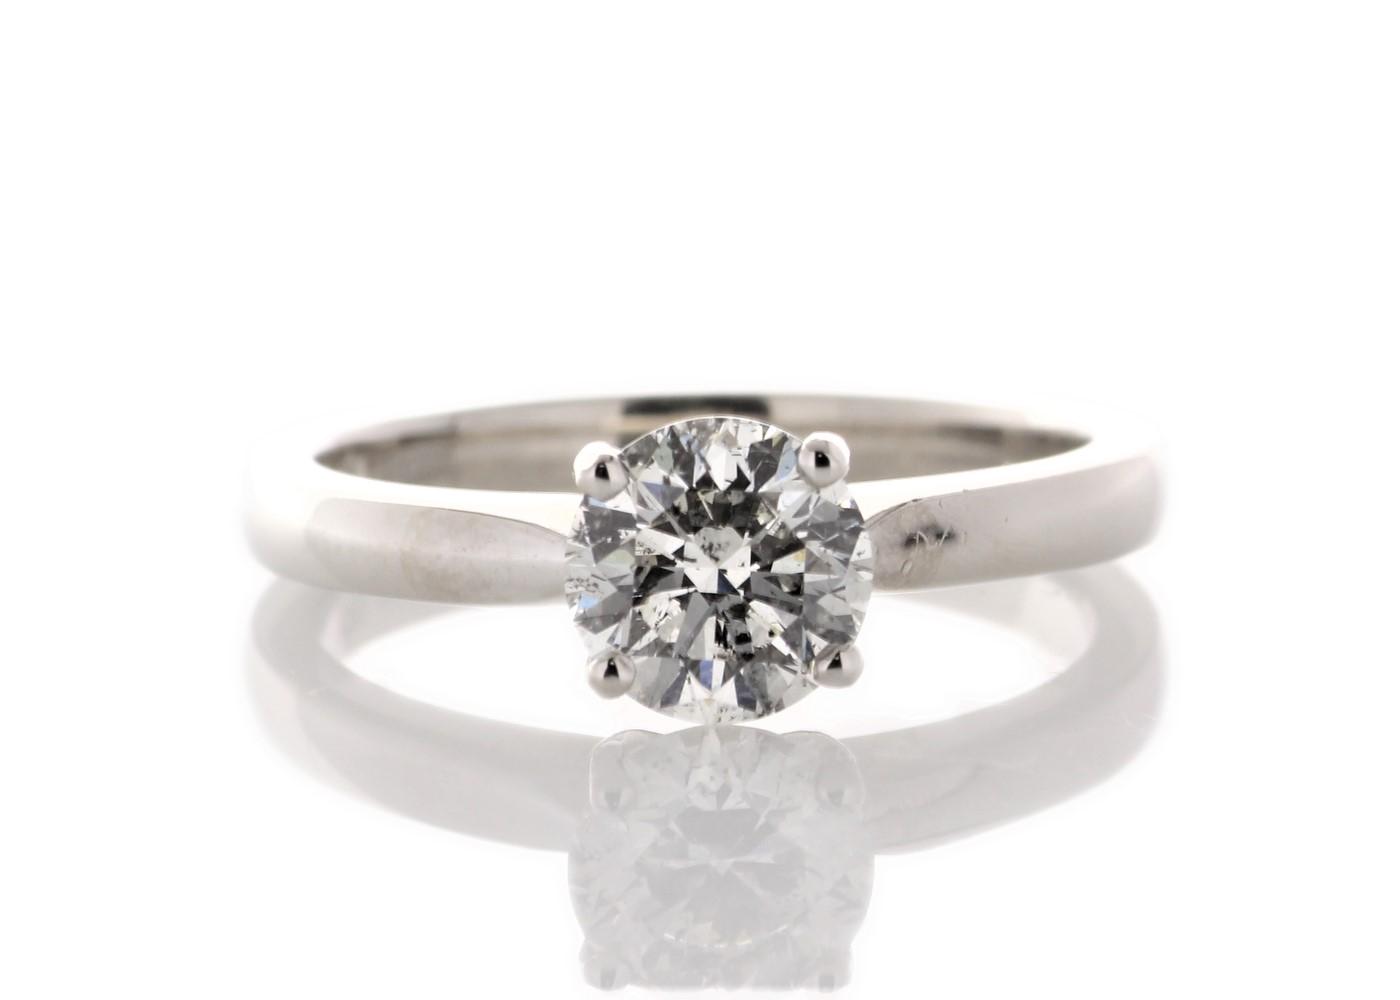 Lot 35 - Platinum Single Stone Claw Set Diamond Ring 1.07 Carats